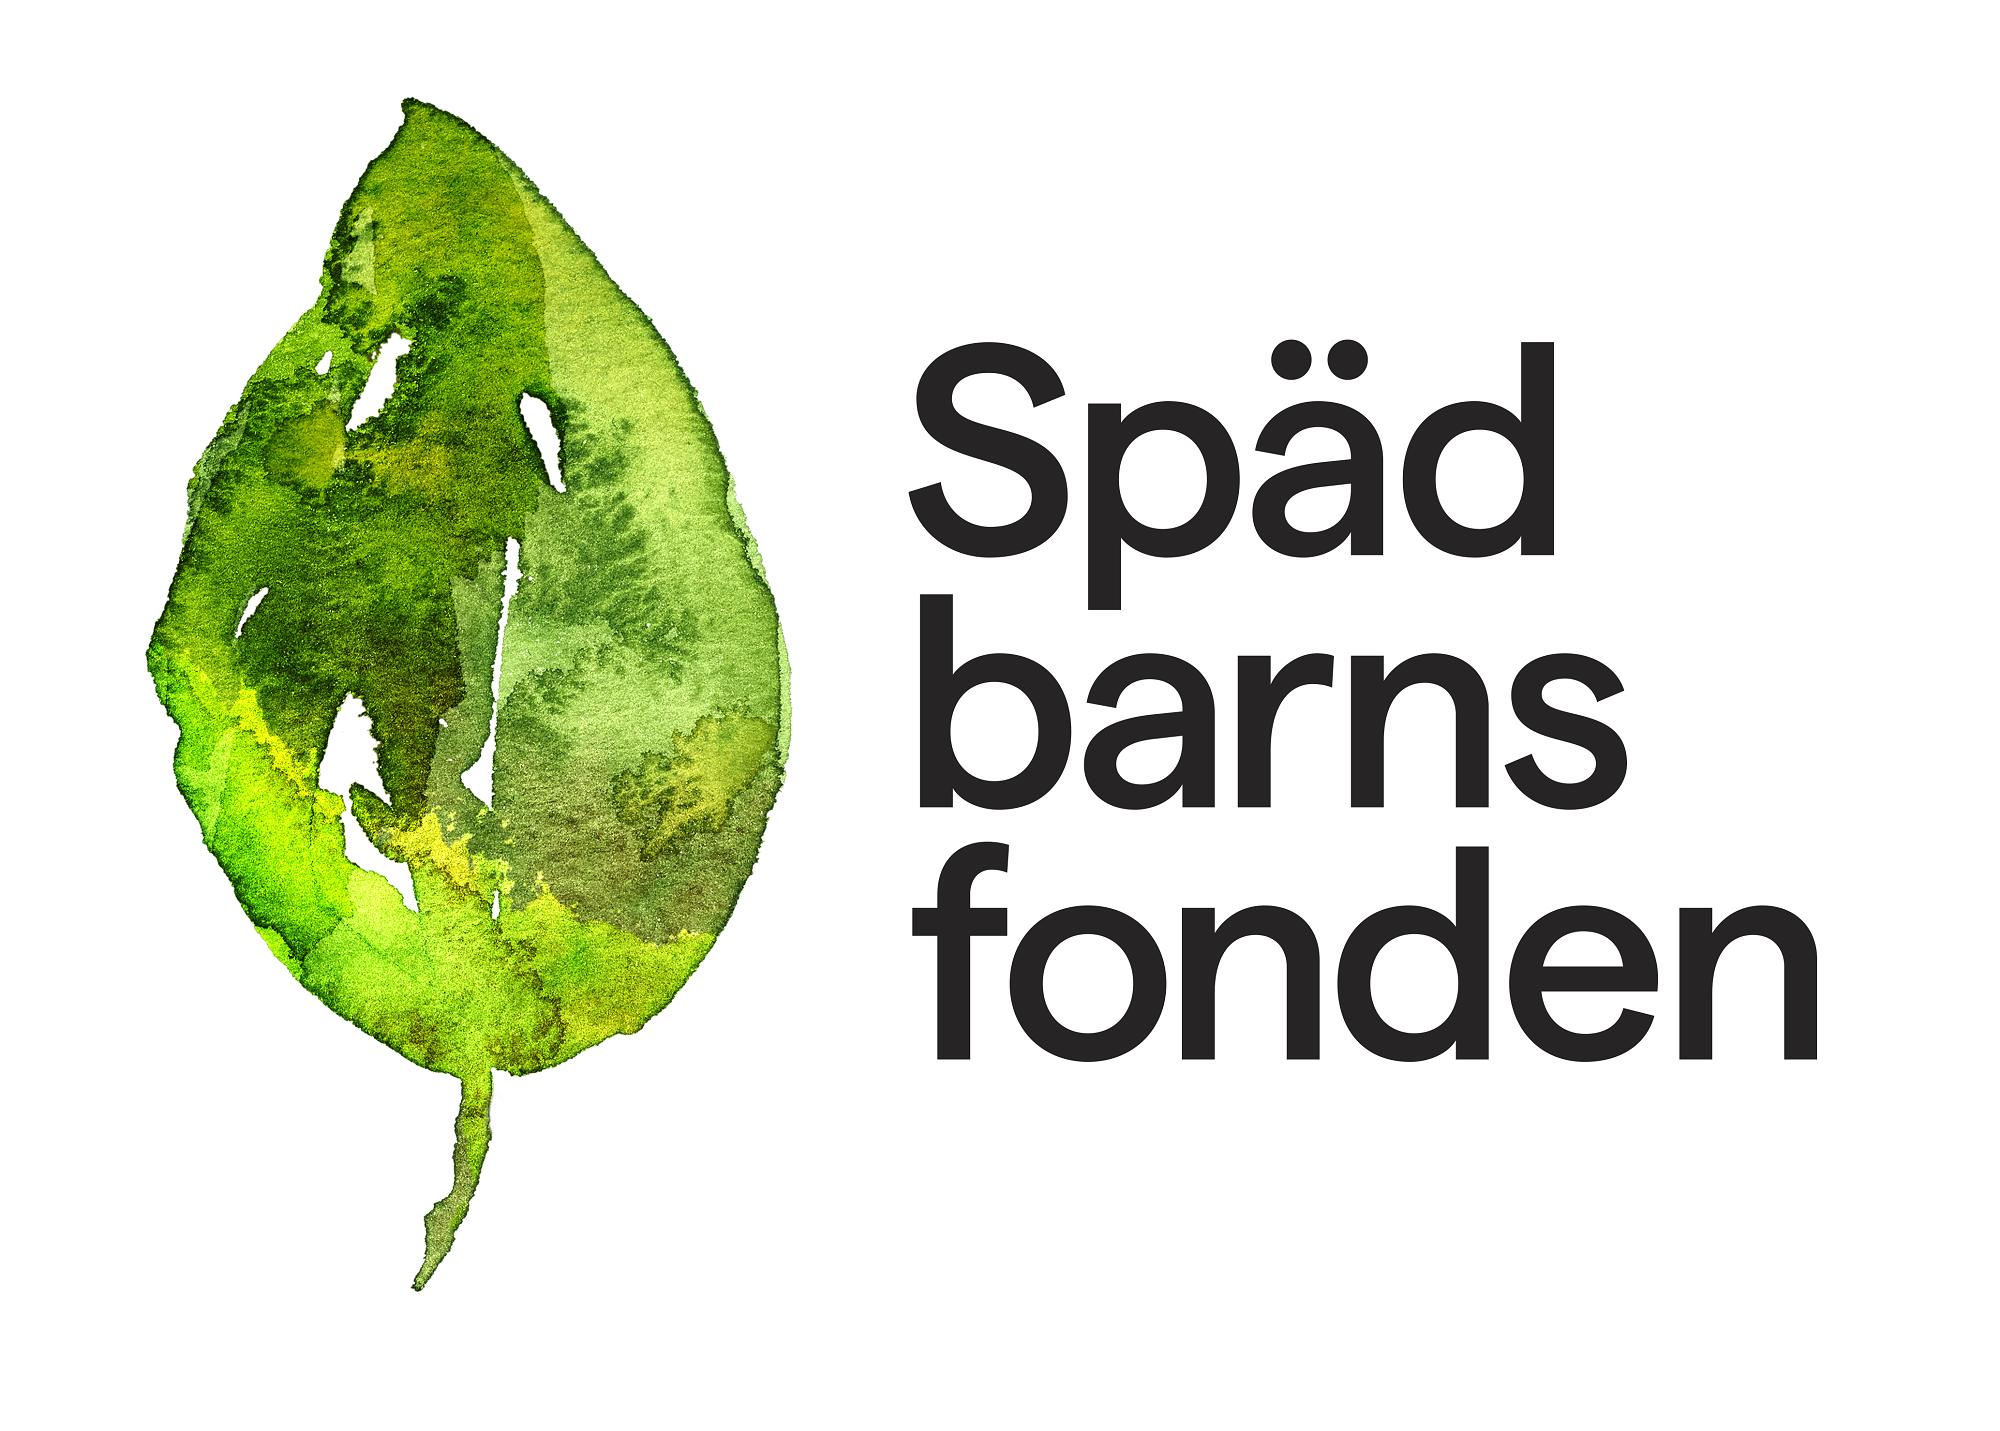 Logo of Swedish Infant Death Foundation (Spadbarnsfonden)